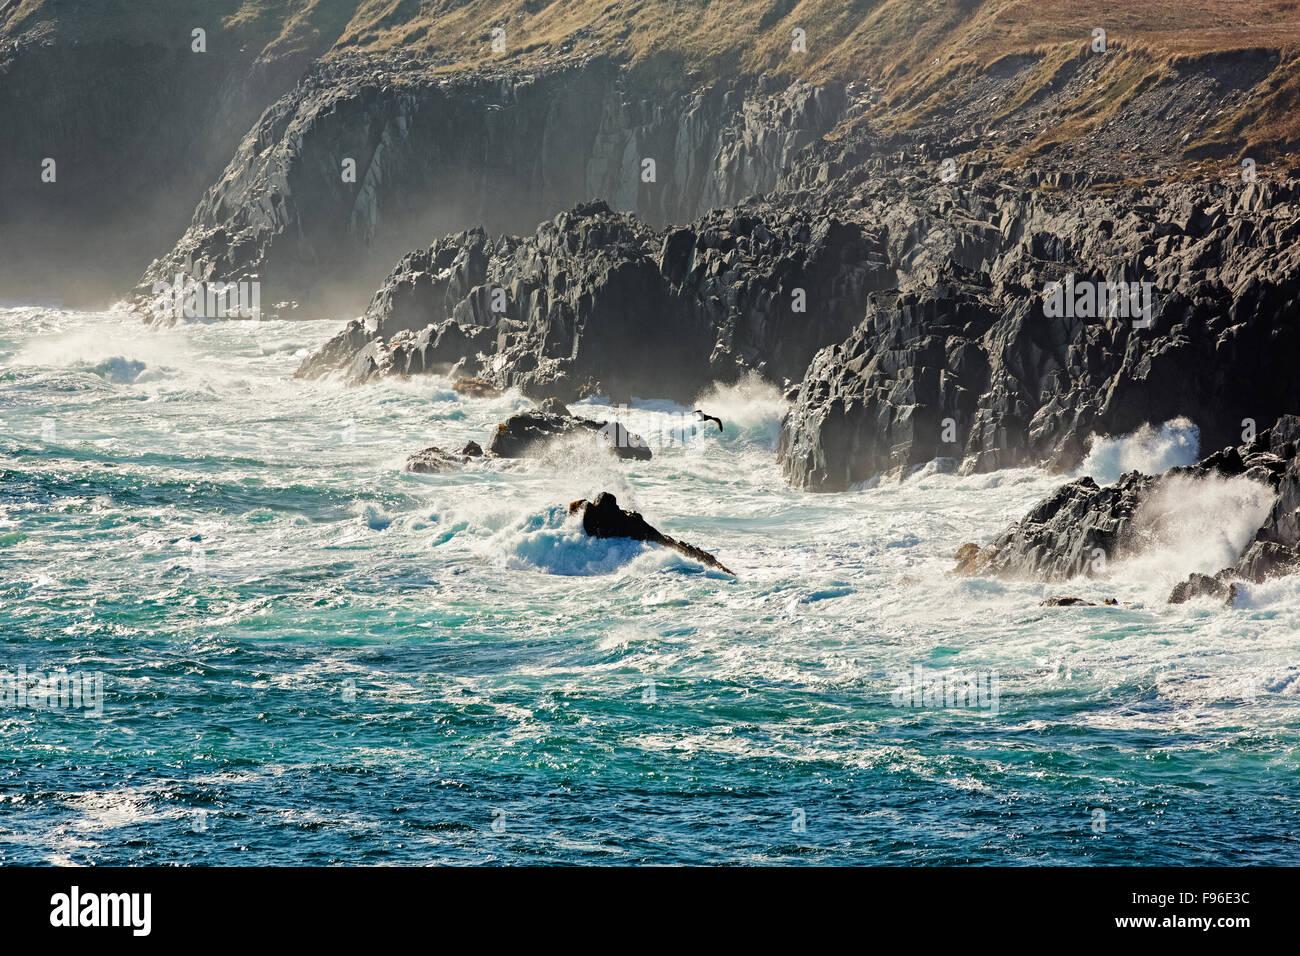 Wellen brechen sich am Küste Leuchtturm Cape Race National Historic Site, Neufundland, Kanada Stockbild